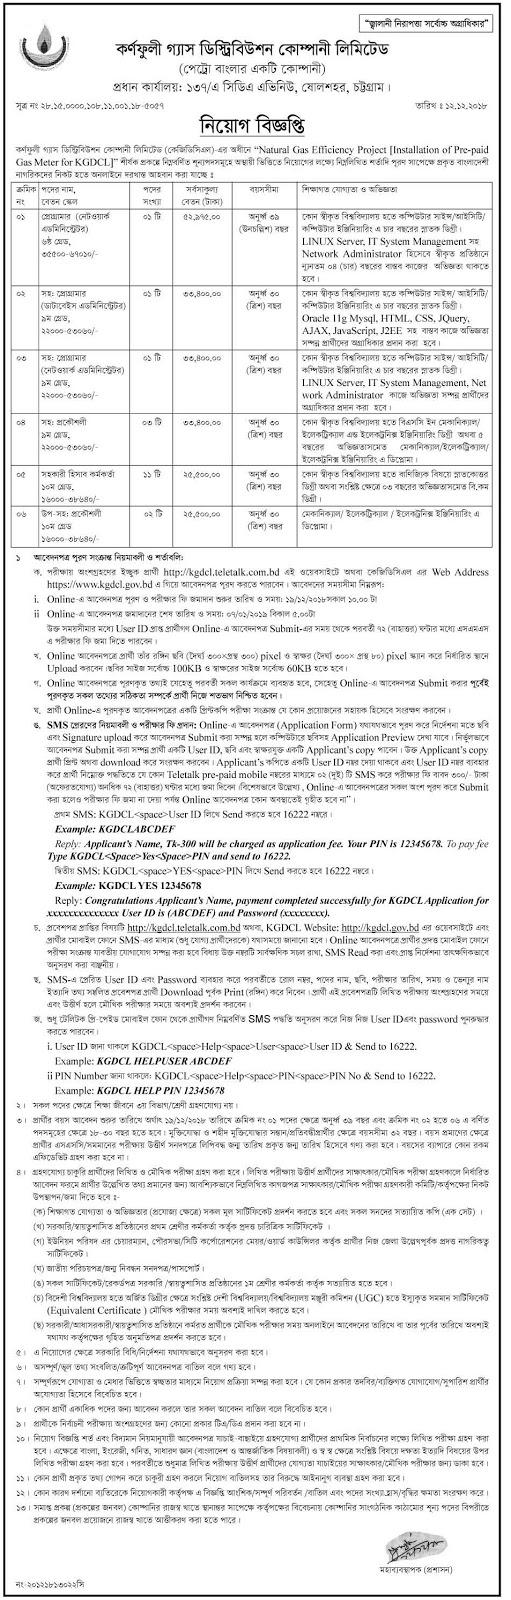 Karnafuli Gas Distribution Company Limited (KGDCL) Job Circular 2018